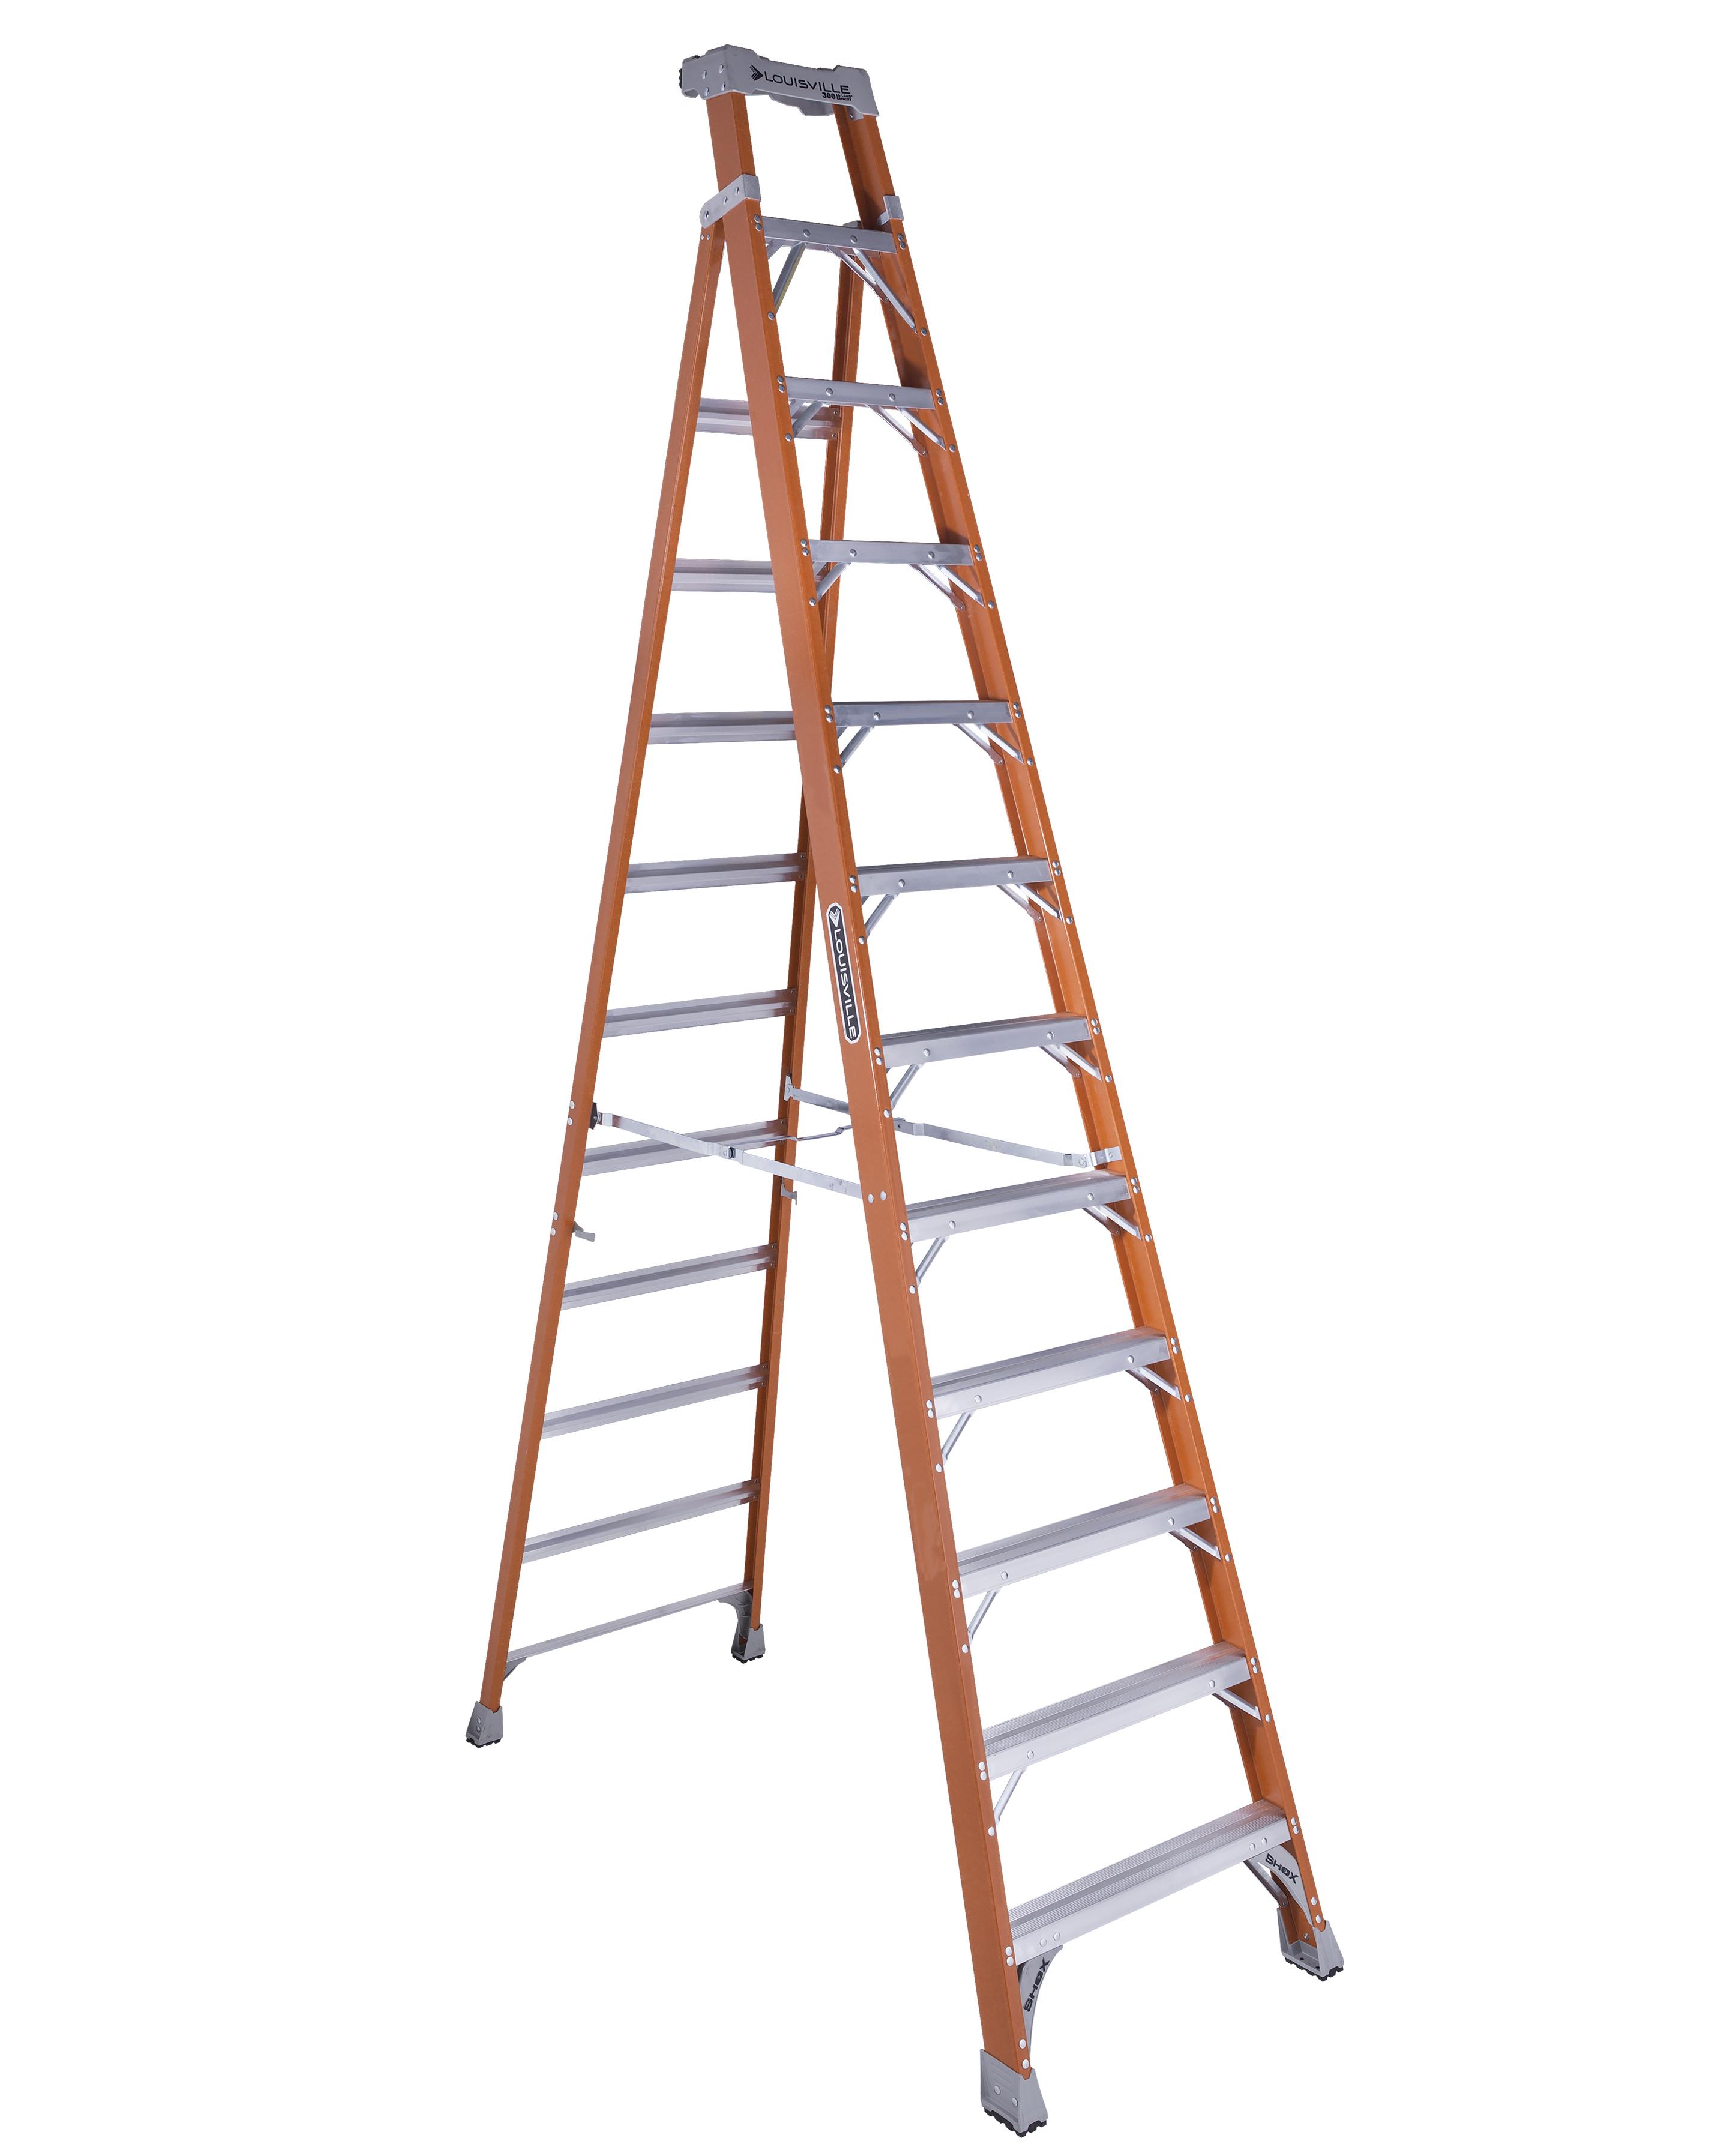 Louisville Ladder FXS1512 12 Foot Orange Fiberglass Step/Shelf Ladder